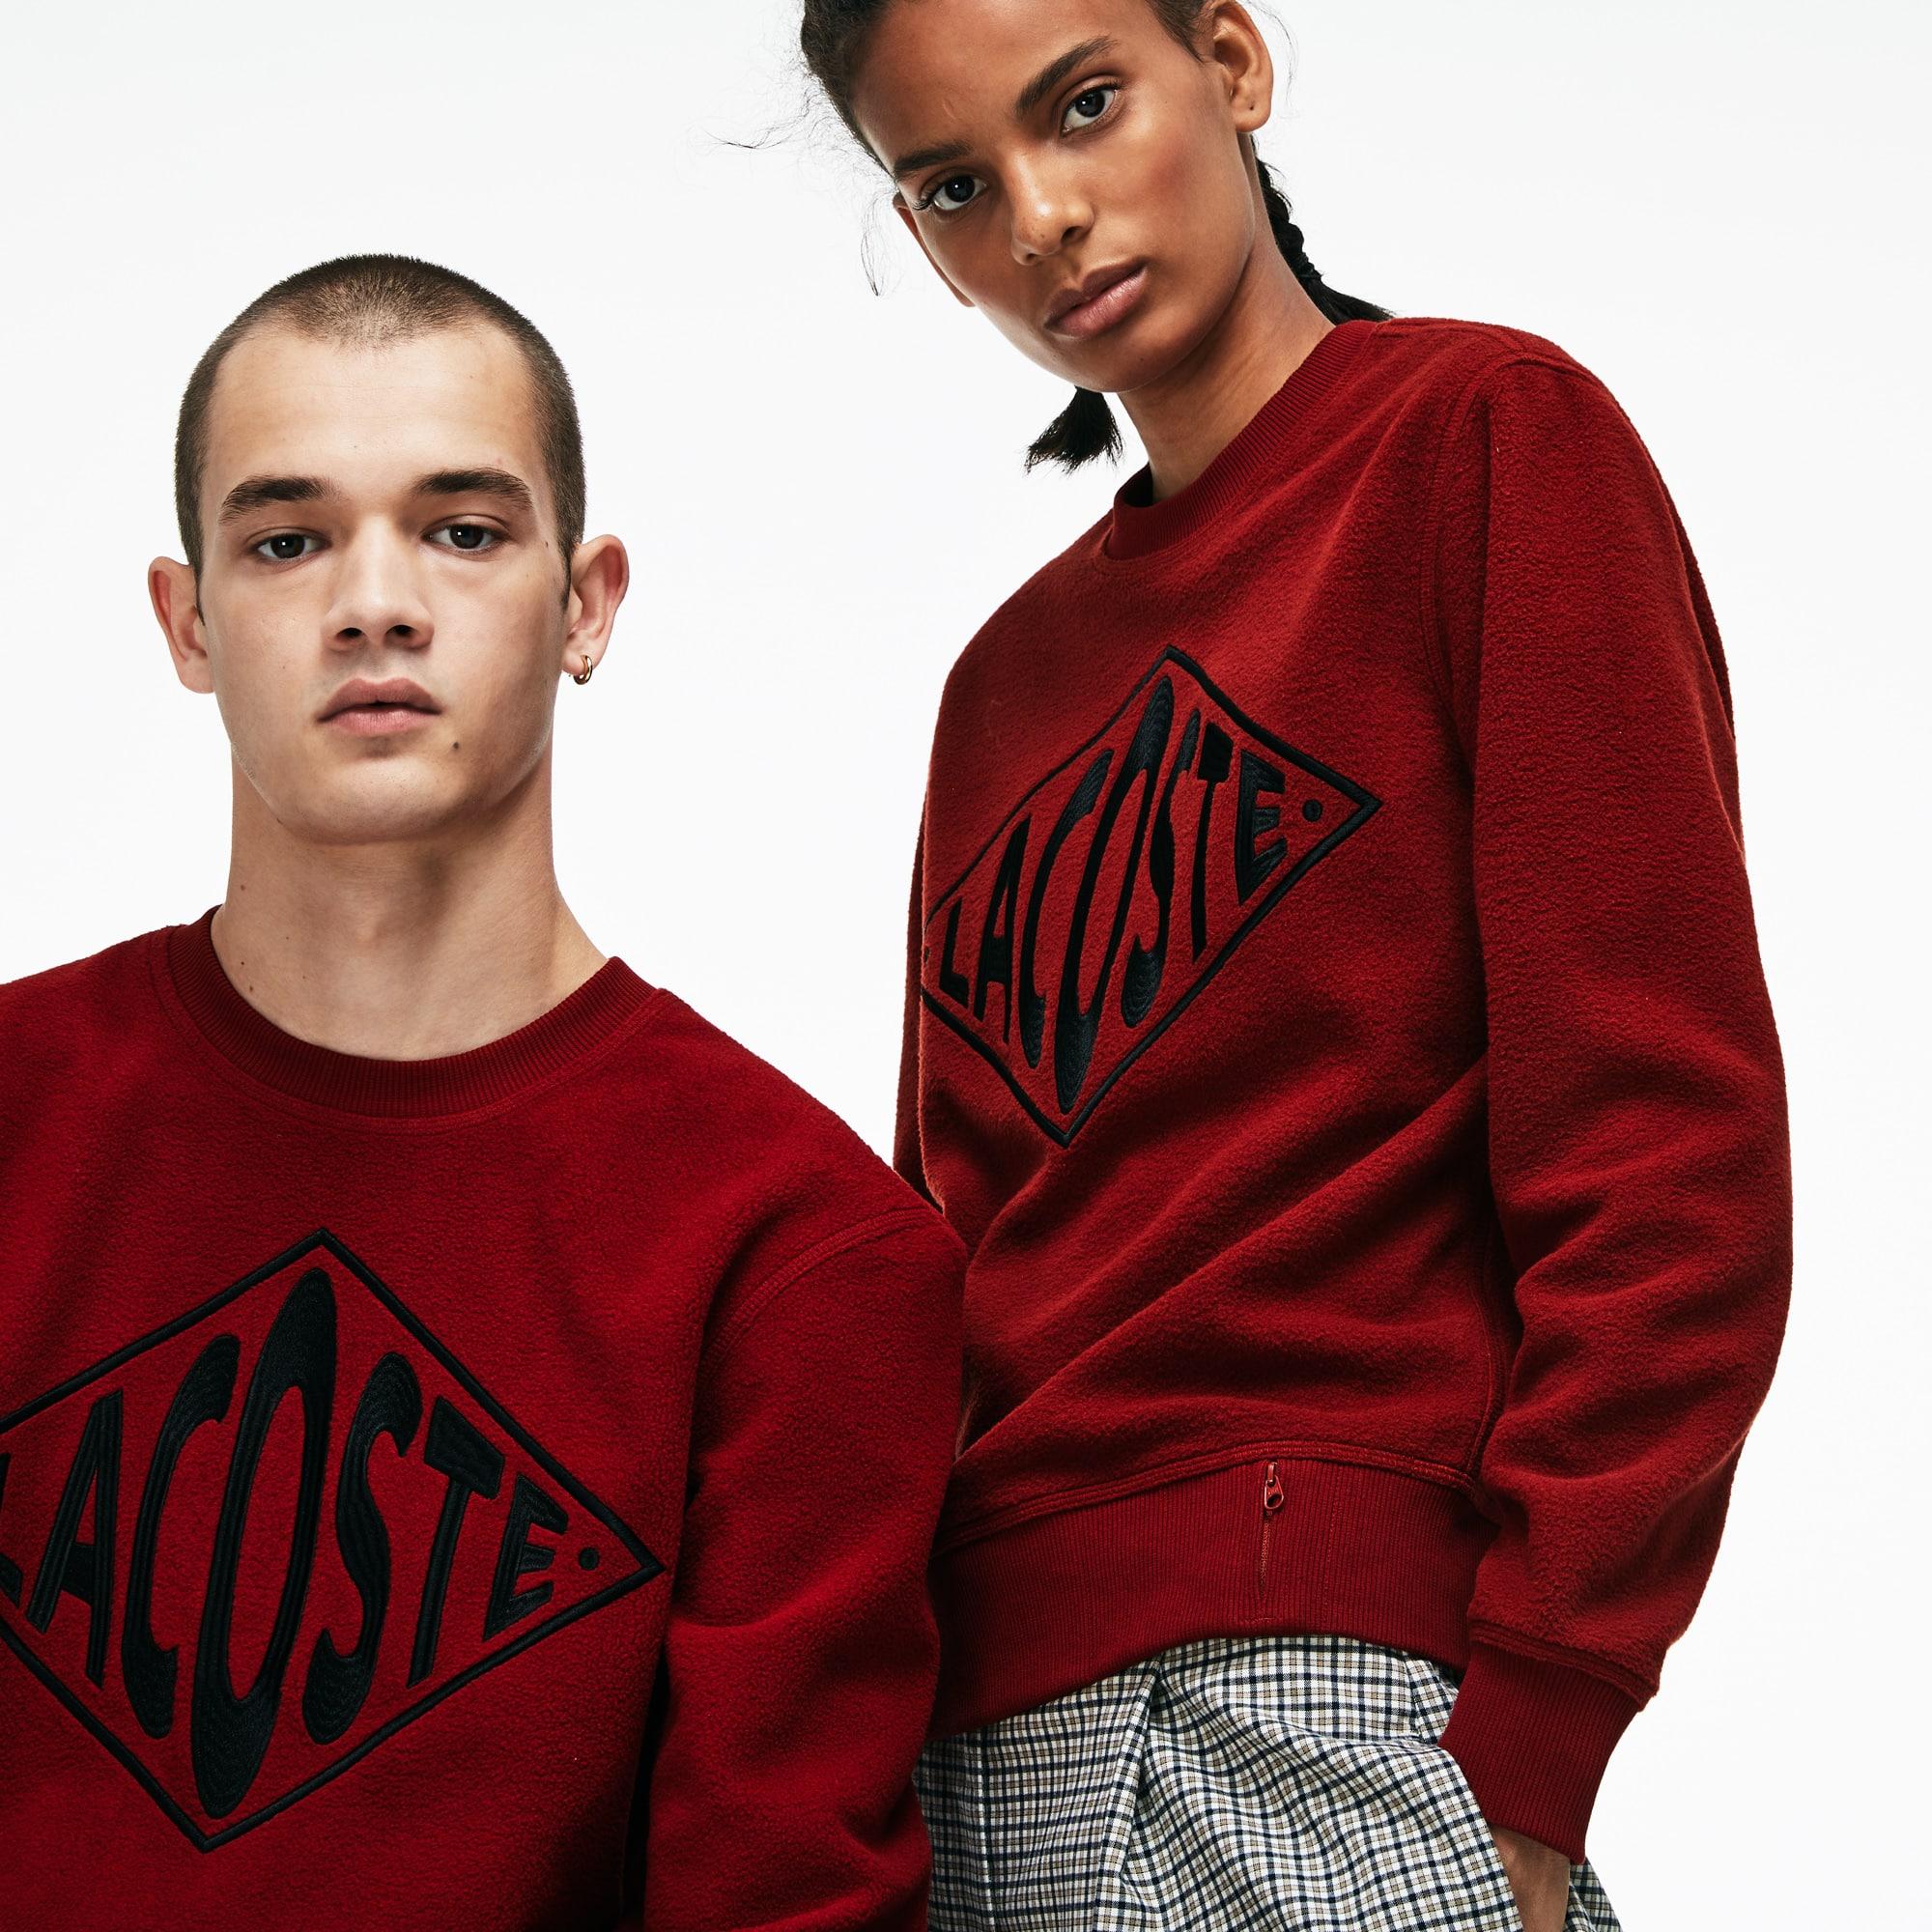 Unisex Lacoste LIVE Crew Neck XL Embroidery Fleece Sweatshirt